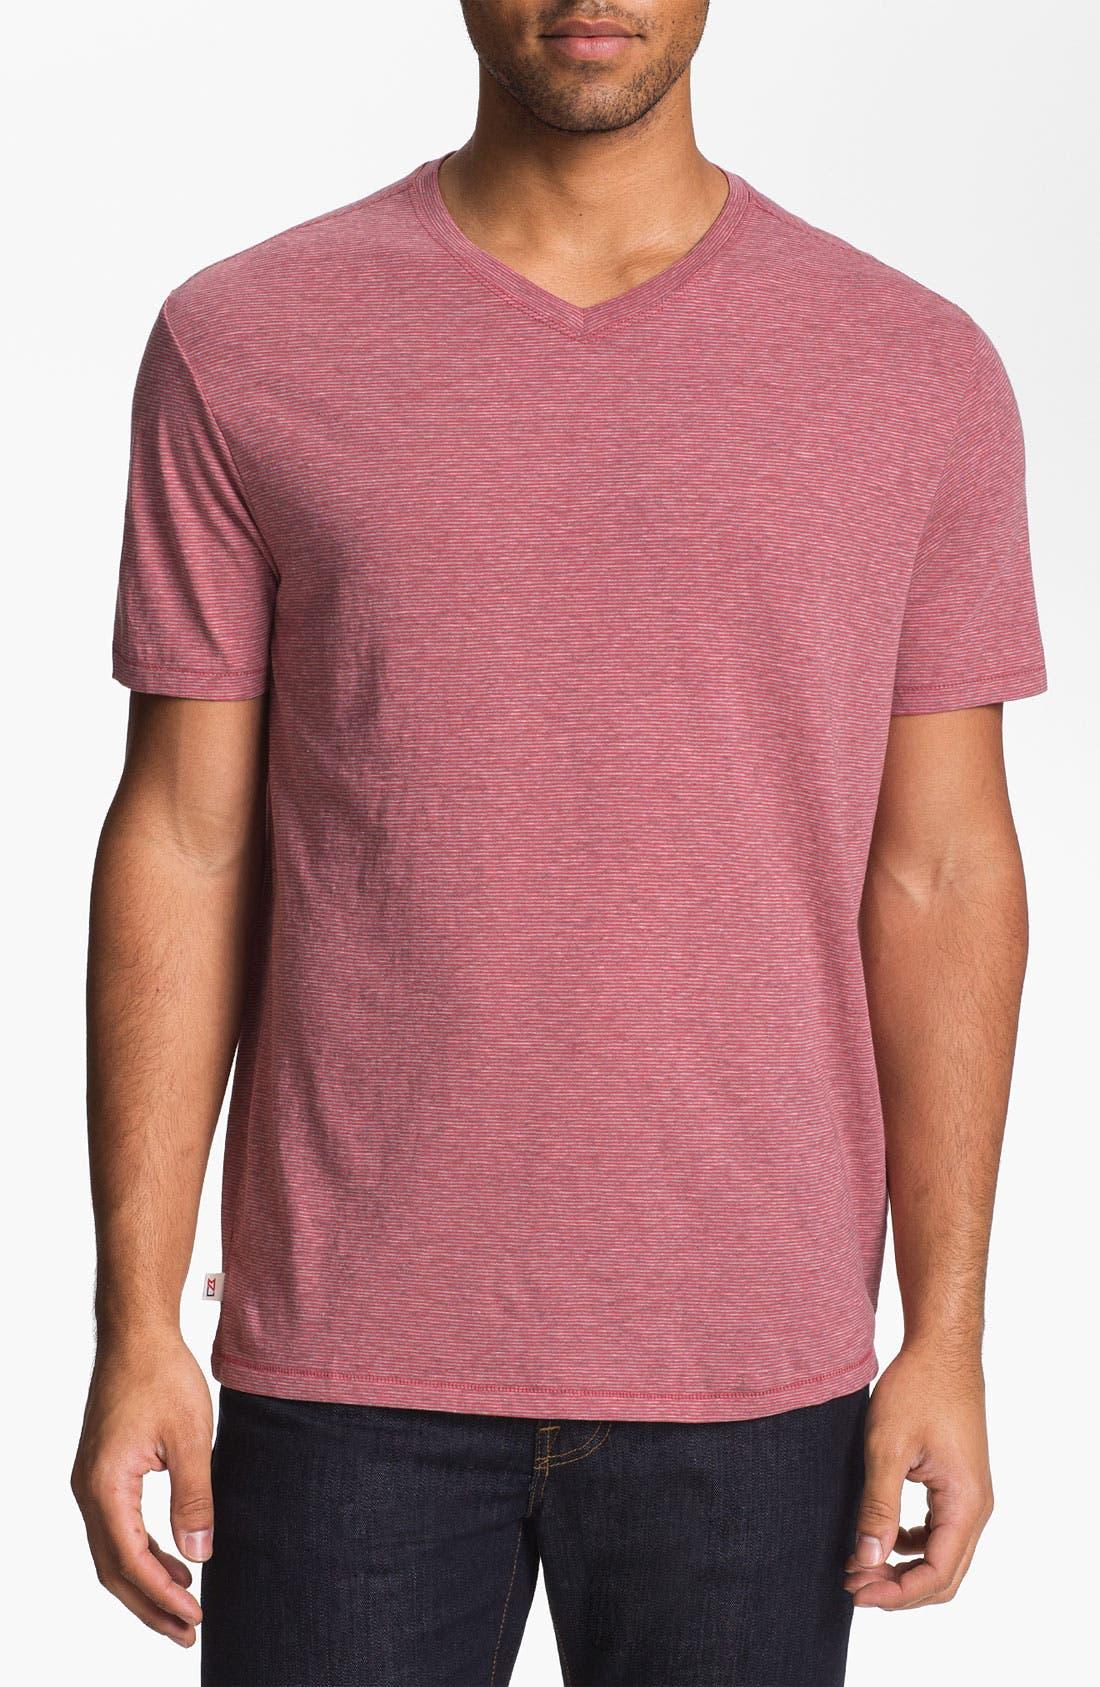 Alternate Image 1 Selected - Cutter & Buck 'Vashon' V-Neck T-Shirt (Big & Tall)